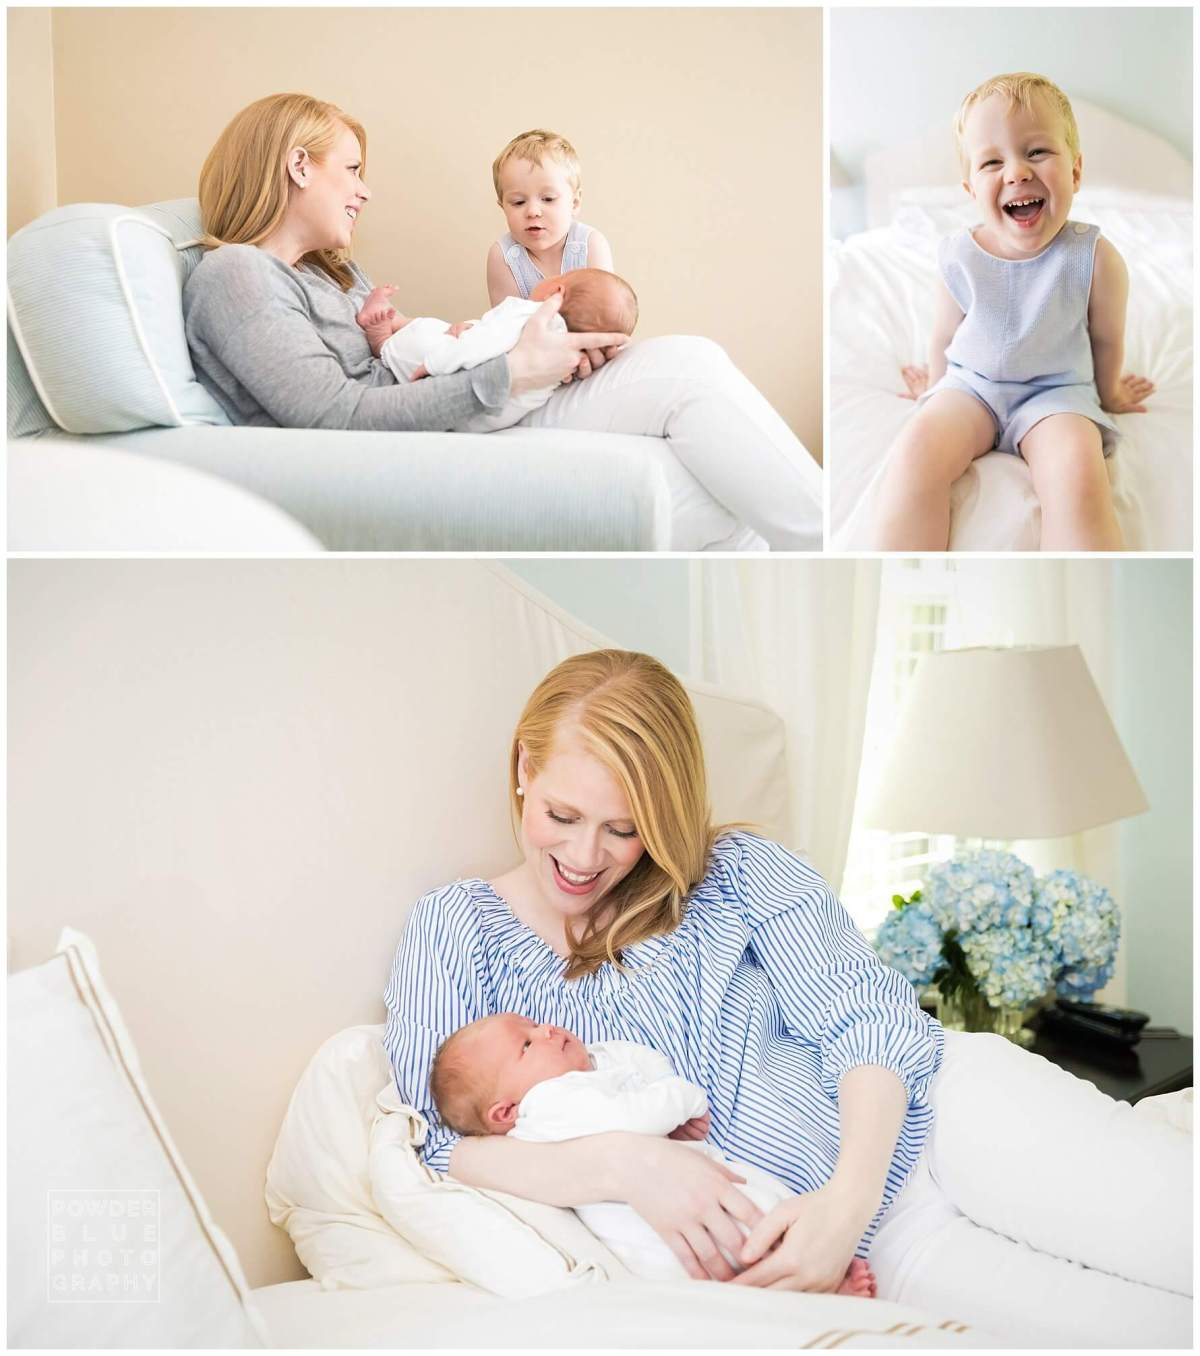 blue and white, neutral interior, newborn, toddler, mom and newborn